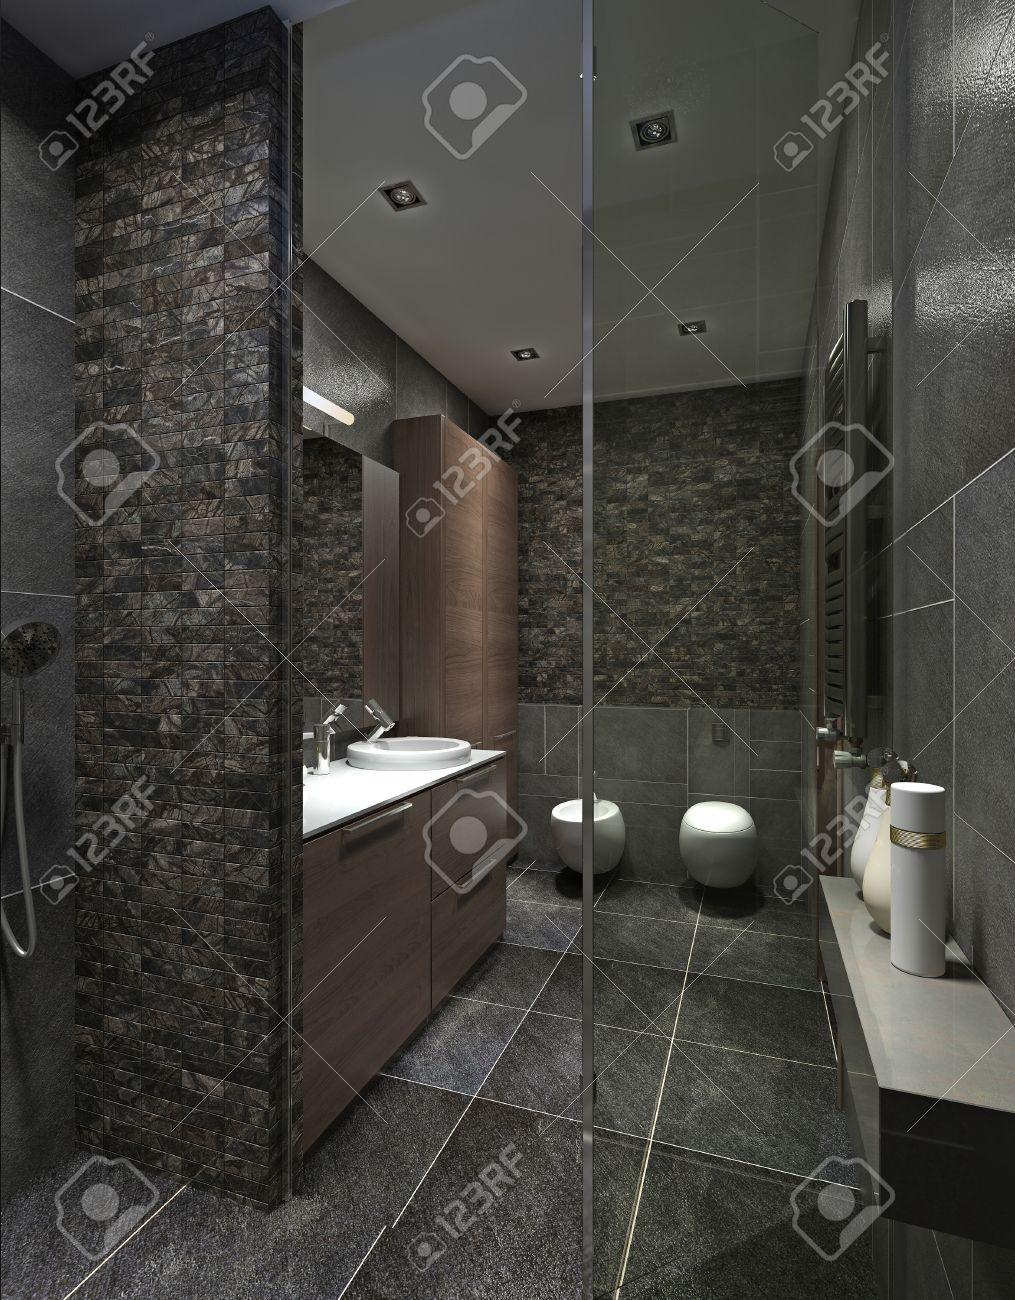 Carrelage Douche Moderne | Carrelage Salle De Bain Moderne Plus ...